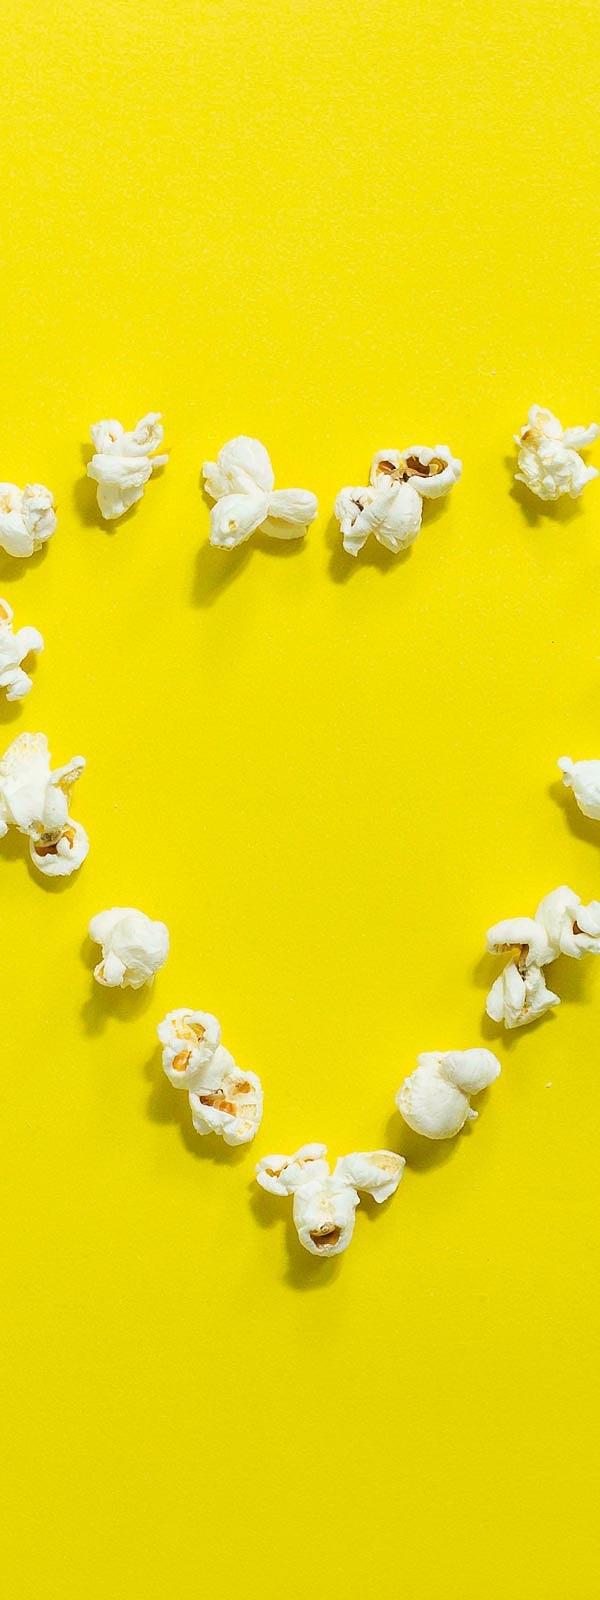 Popcorn Heart Yellow Background